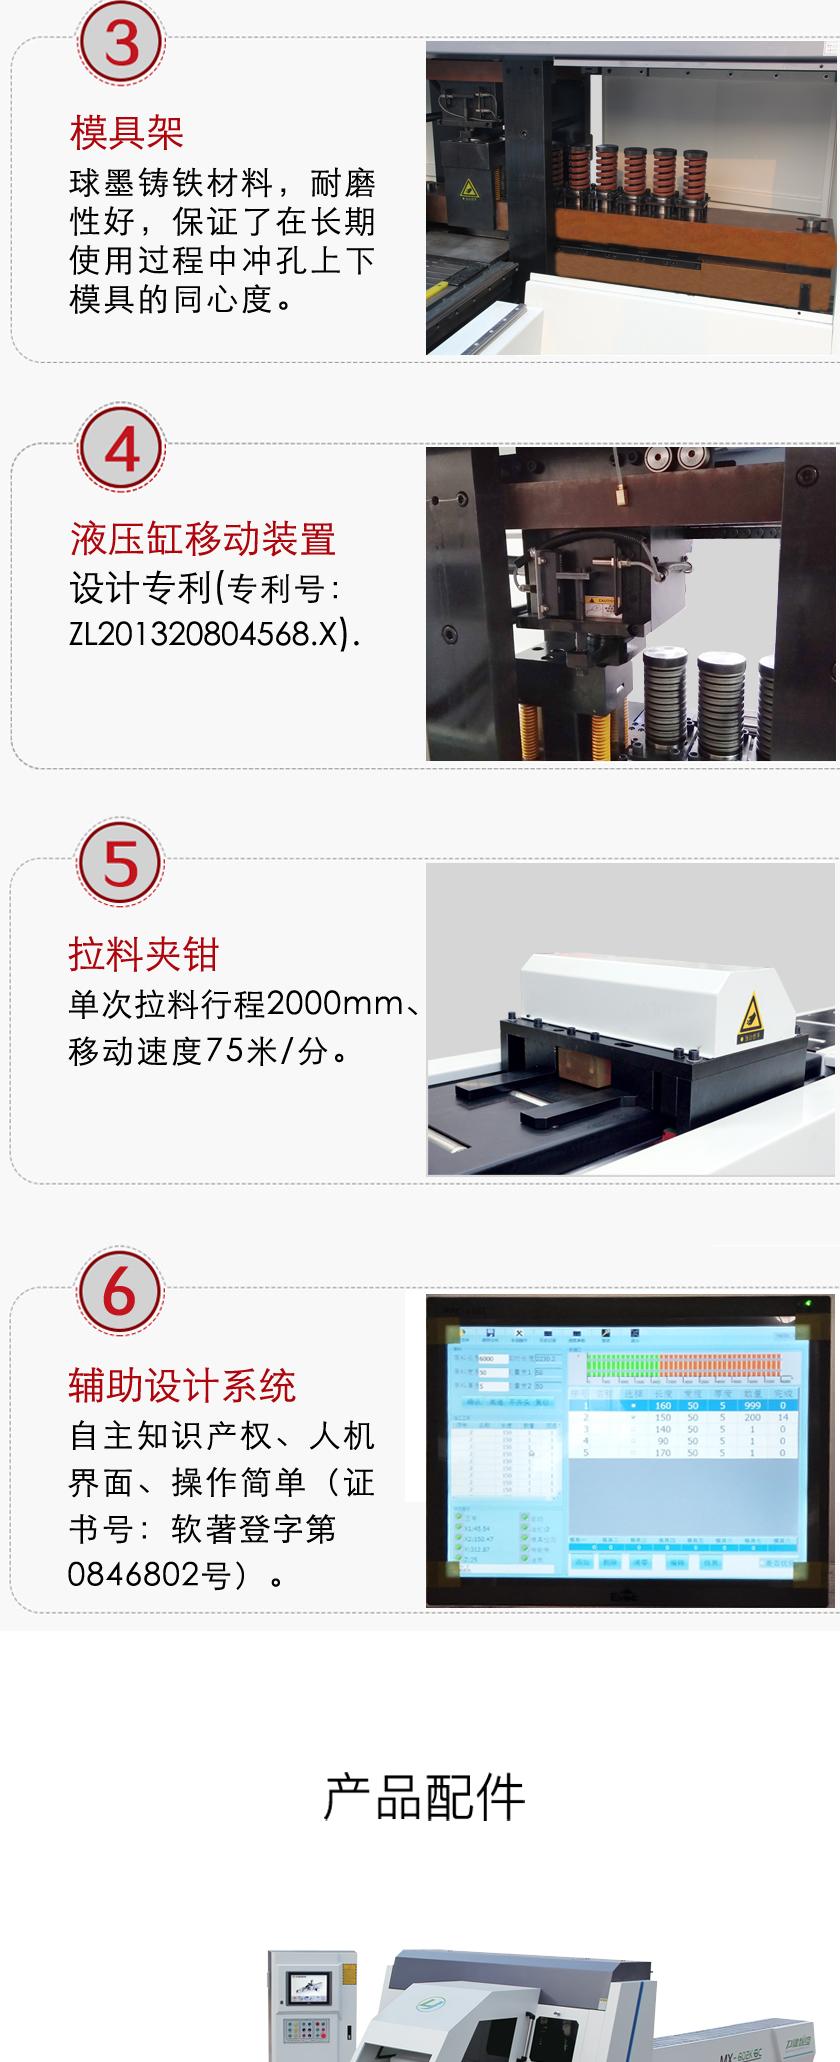 MX602K-6C数控母排冲剪机